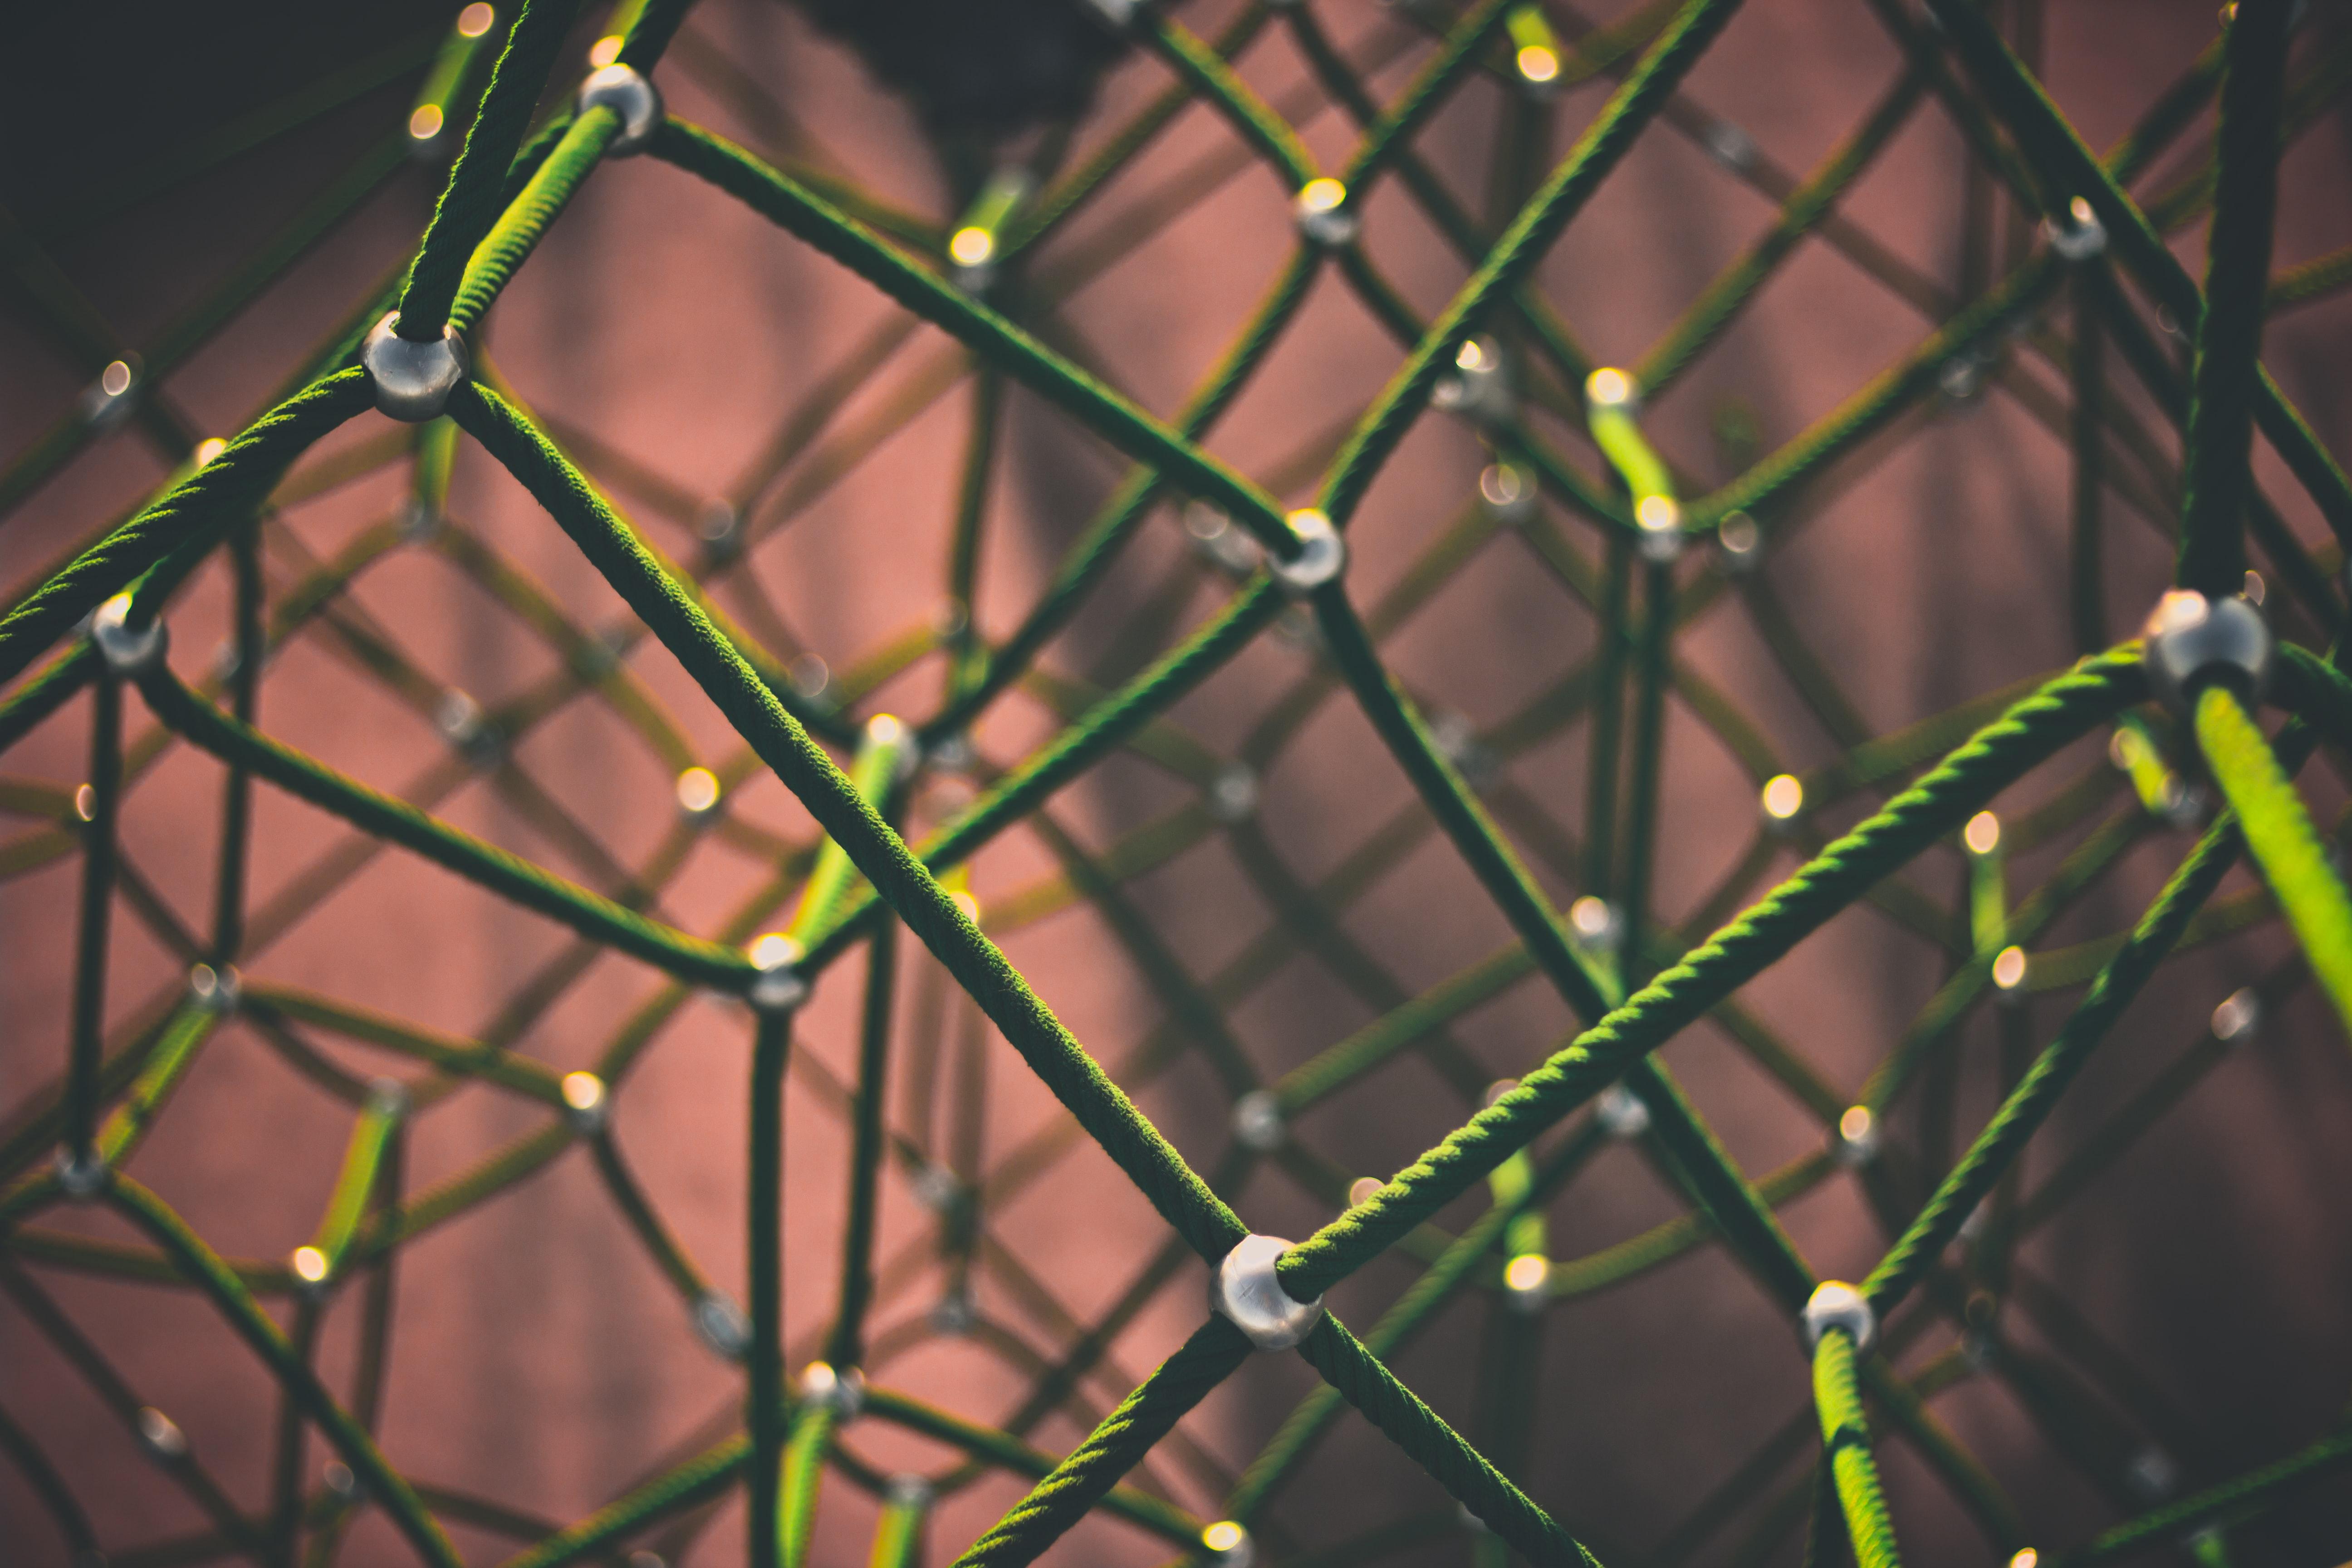 network of mesh